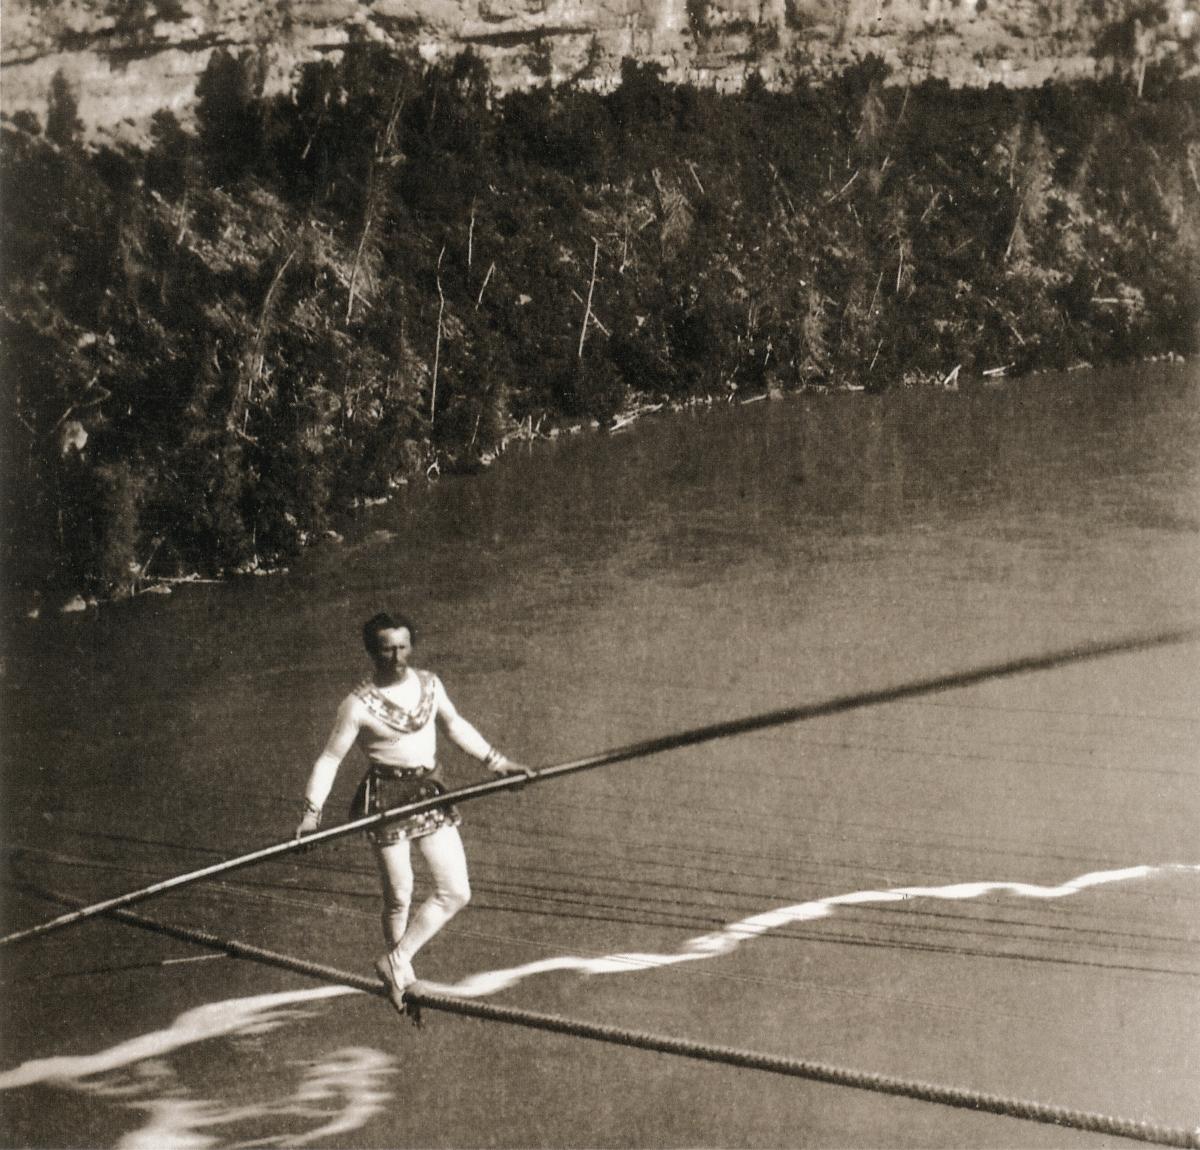 William_England_-_Blondin_crossing_Niagara_river (1).jpg